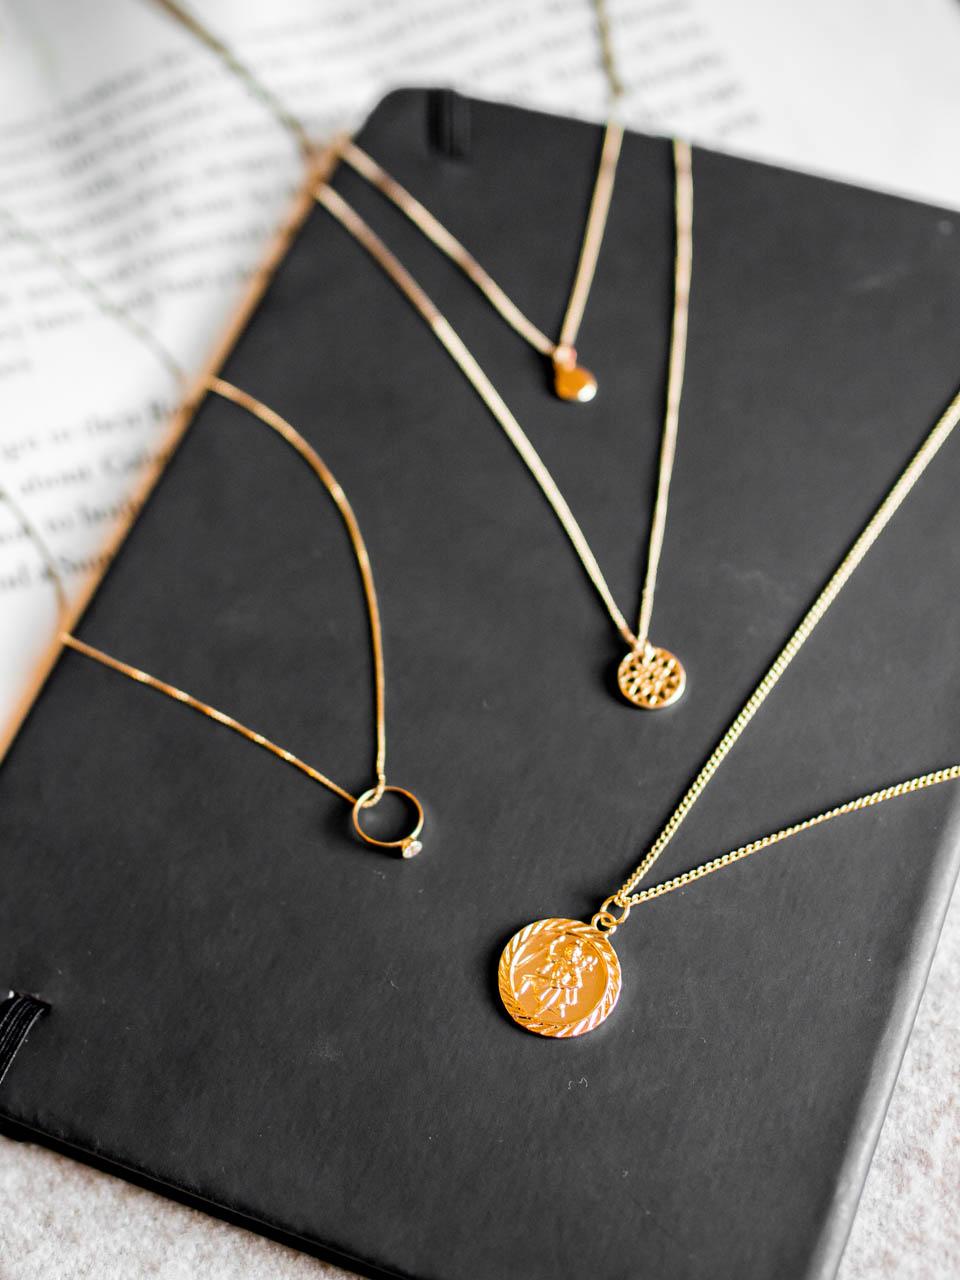 Golden necklaces Asos - Kultaiset kaulakorut Asos